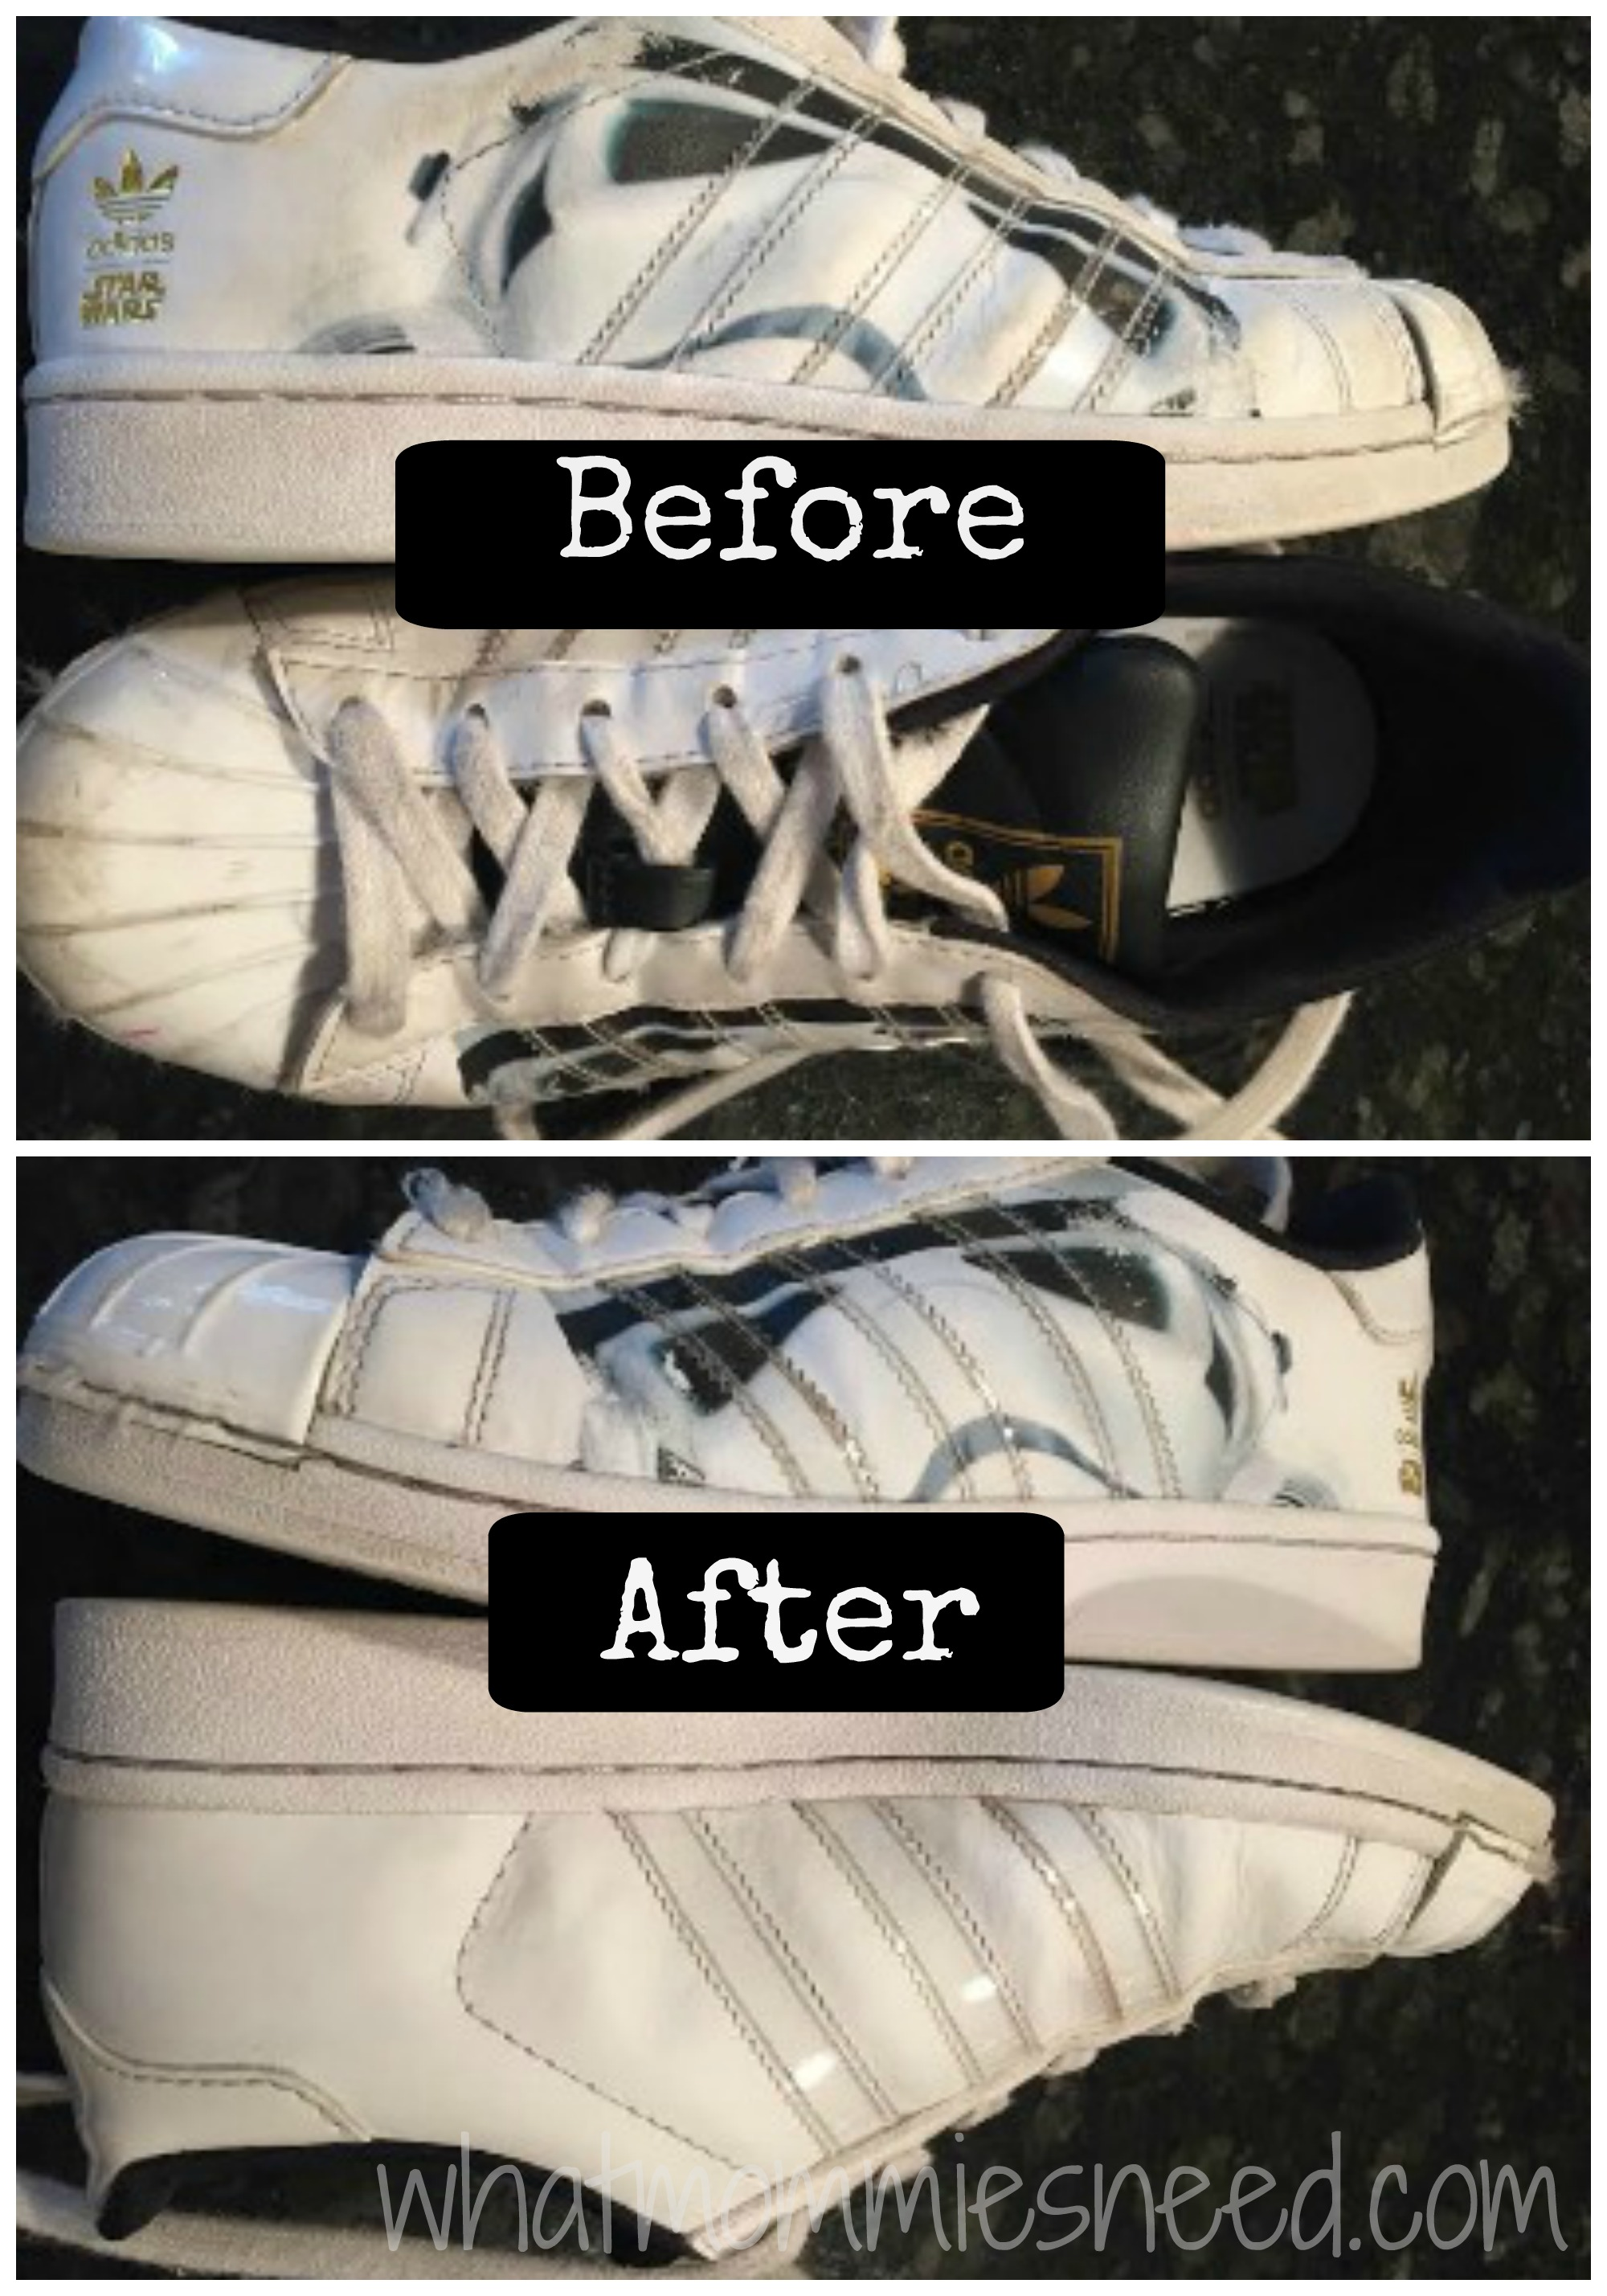 magic eraser shoes. Mr. Clean ...